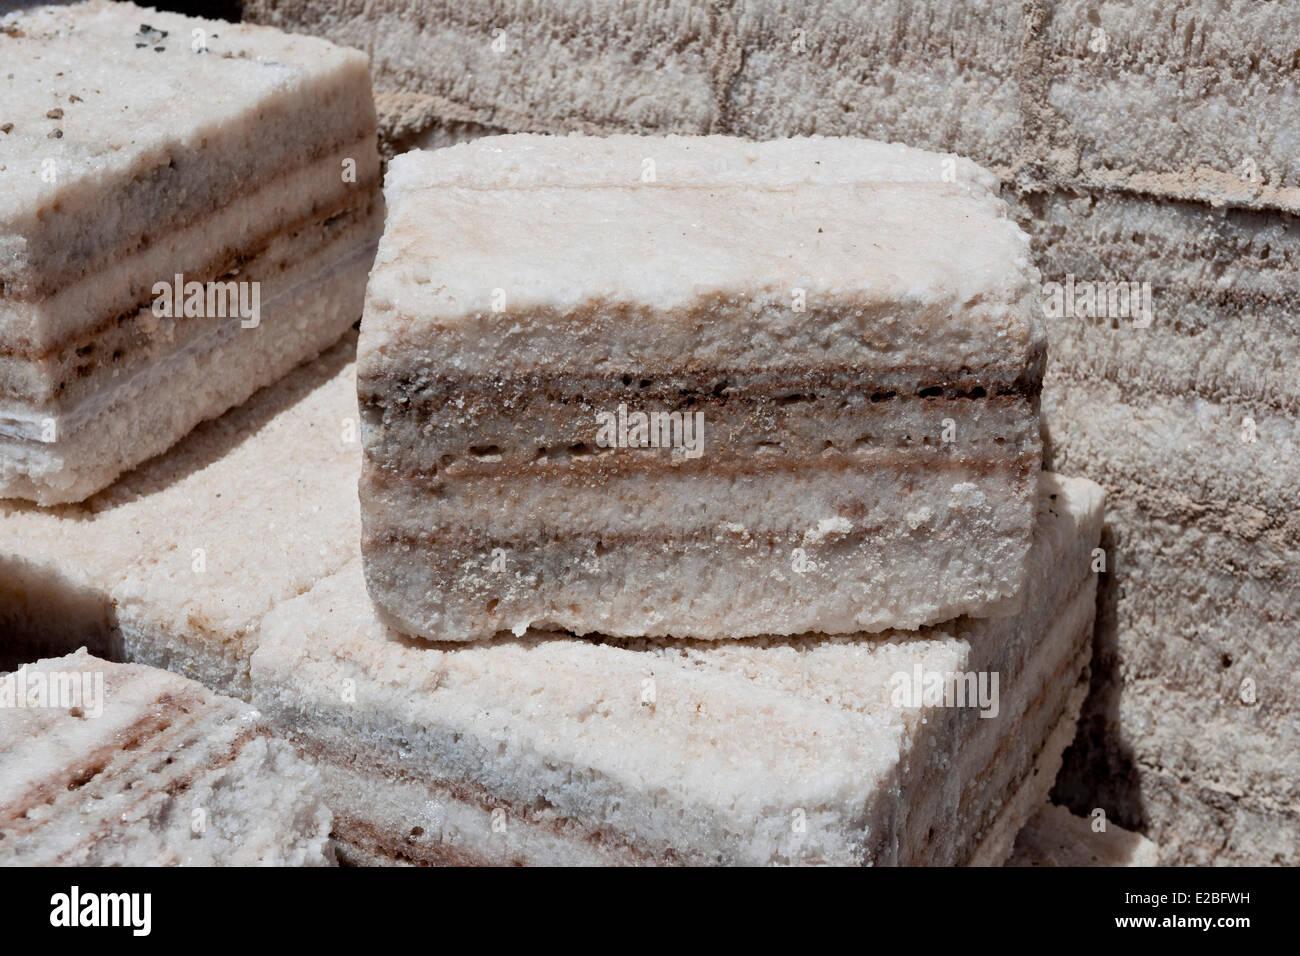 Bolivia, Potosi Department, Salar de Uyuni, Colchani village, salt brick - Stock Image